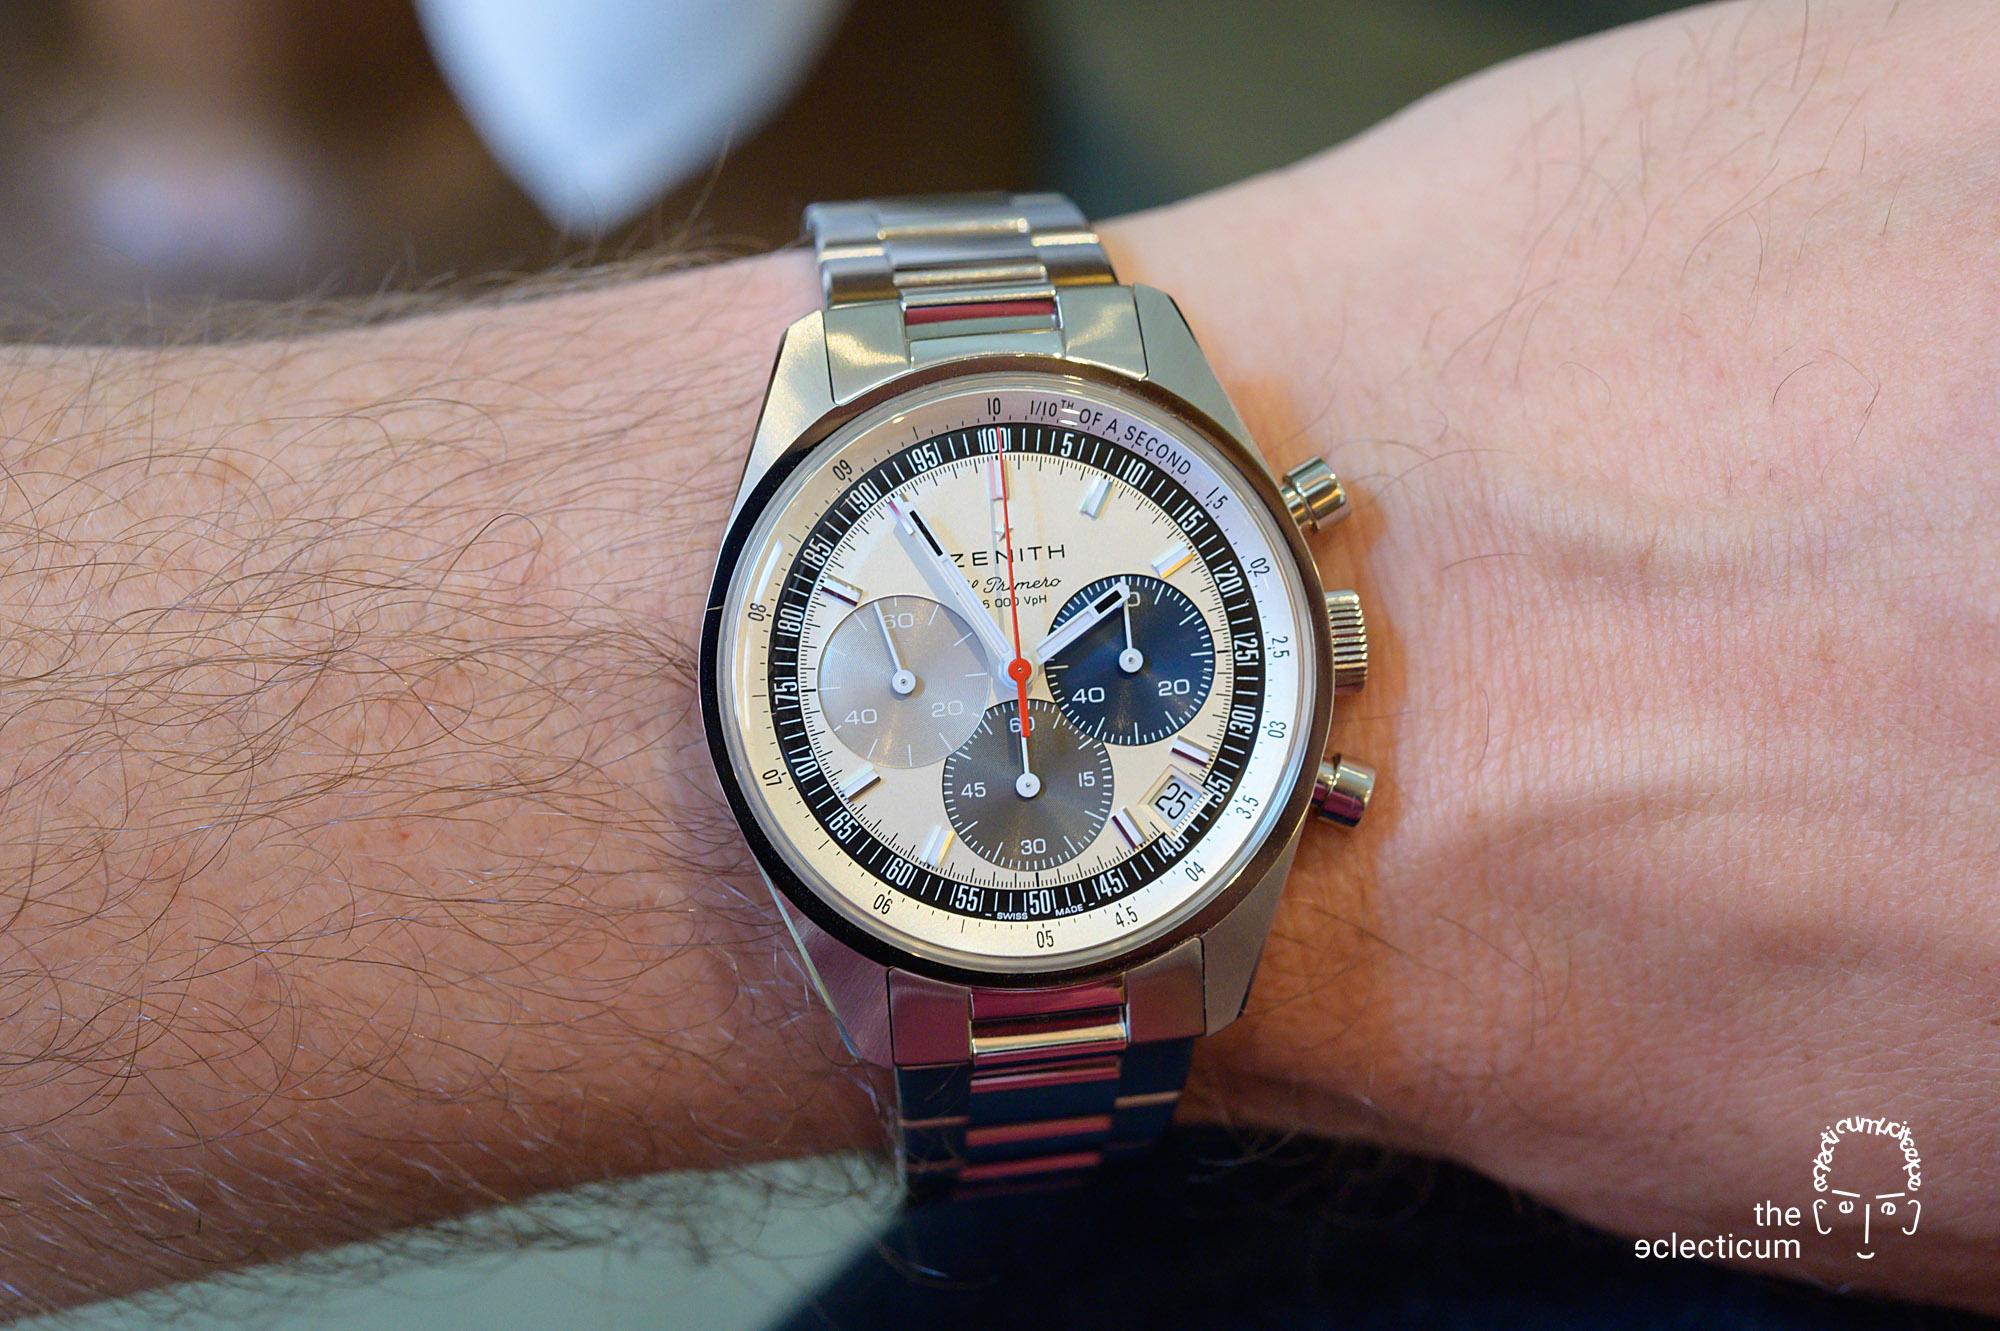 Zenith Chronomaster Original El Primero Cal. 3600 stainless steel bracelet